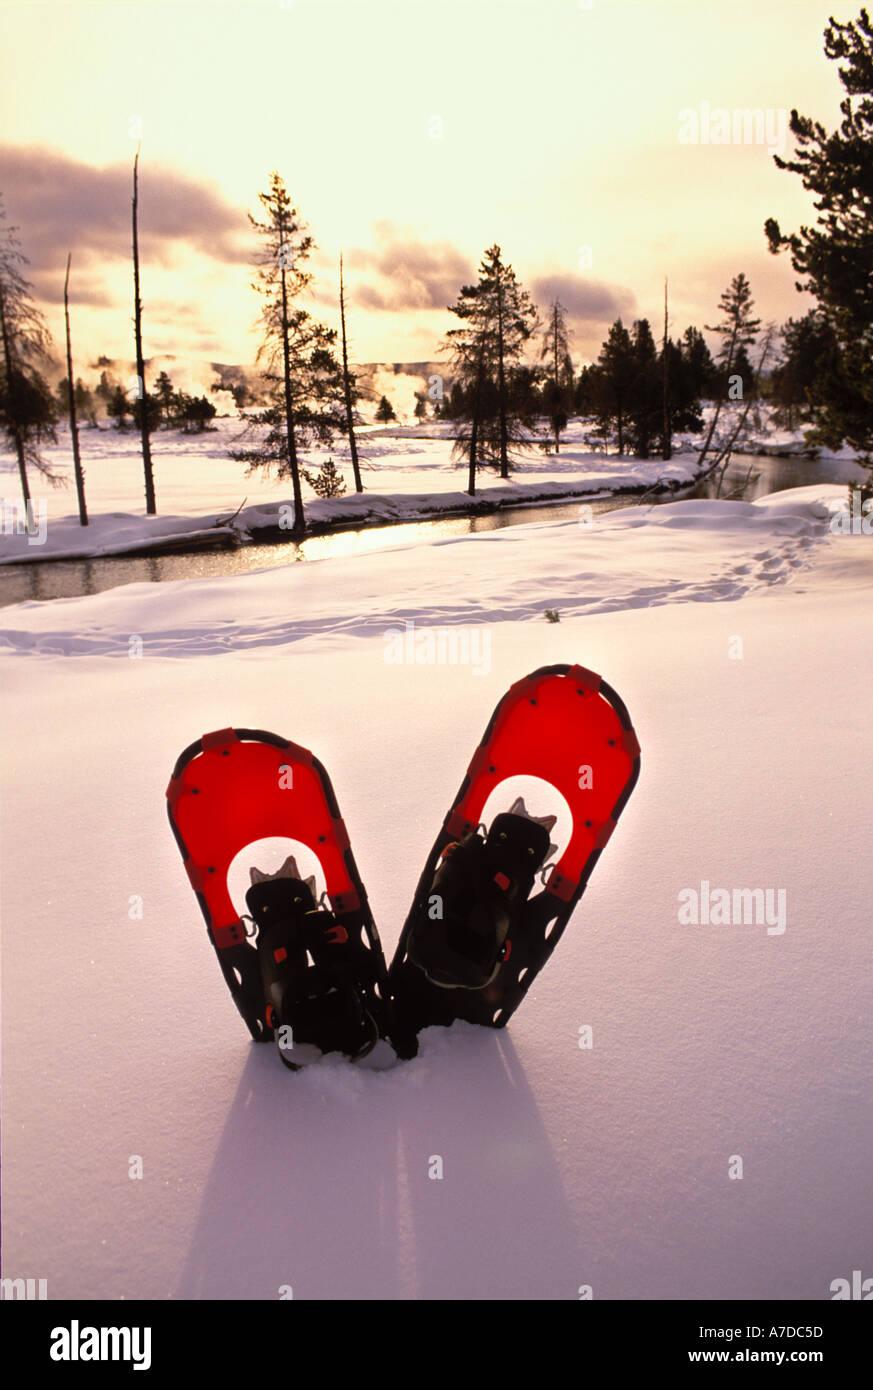 Schneeschuhe im Schnee auf dem Firehole River in Wyoming Yellowstone-Nationalpark Stockbild